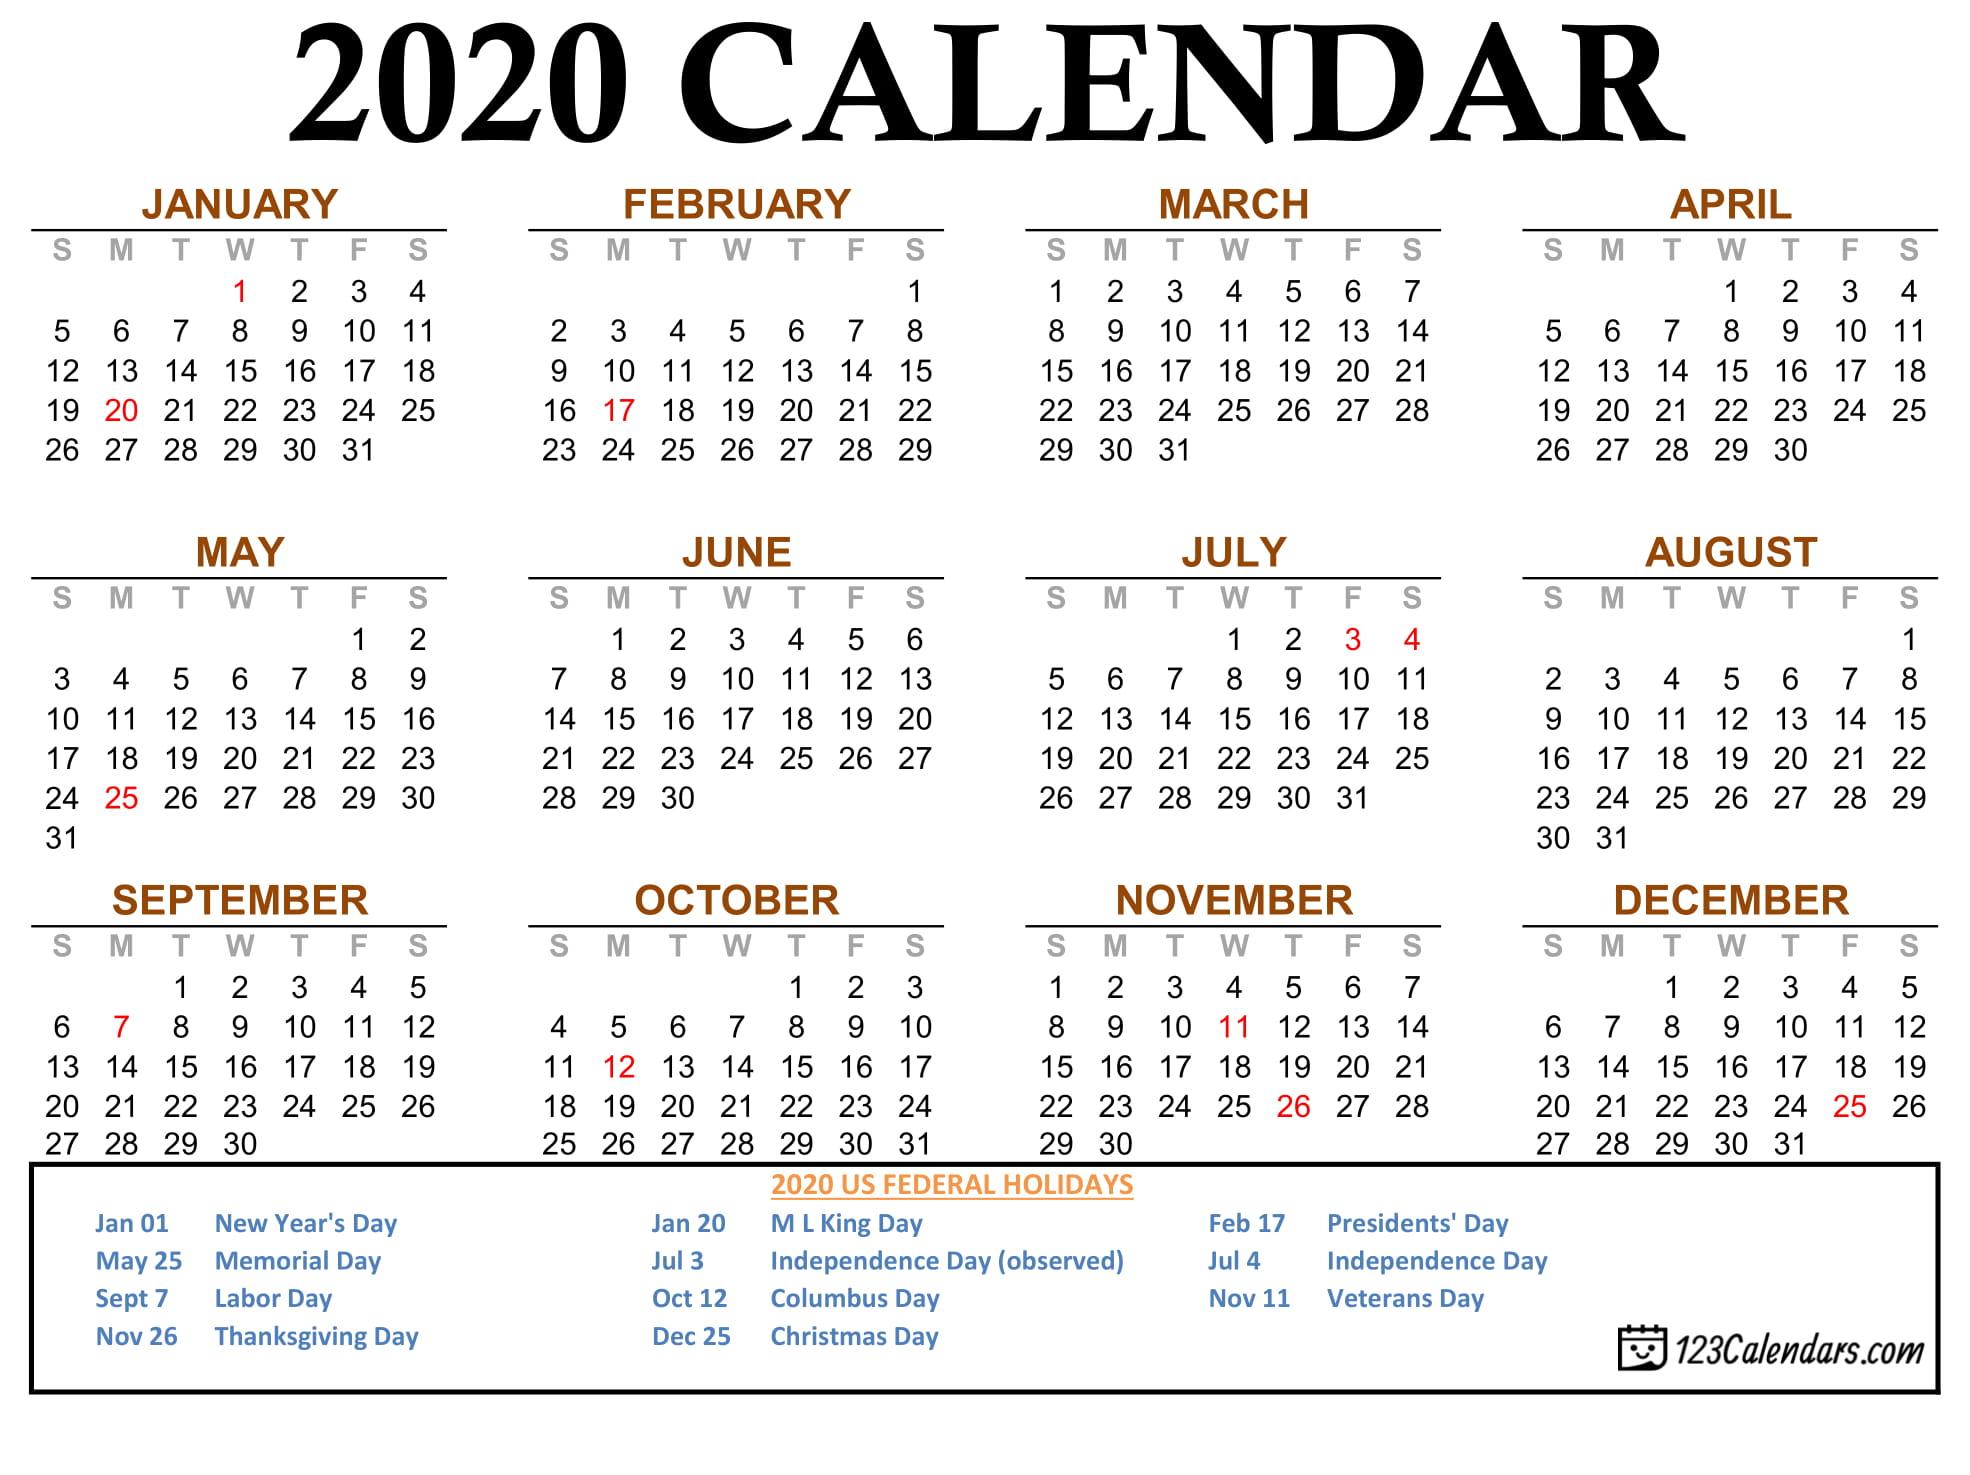 Free Printable 2020 Calendar | 123Calendars in Printable 2020 Wallet Calendar